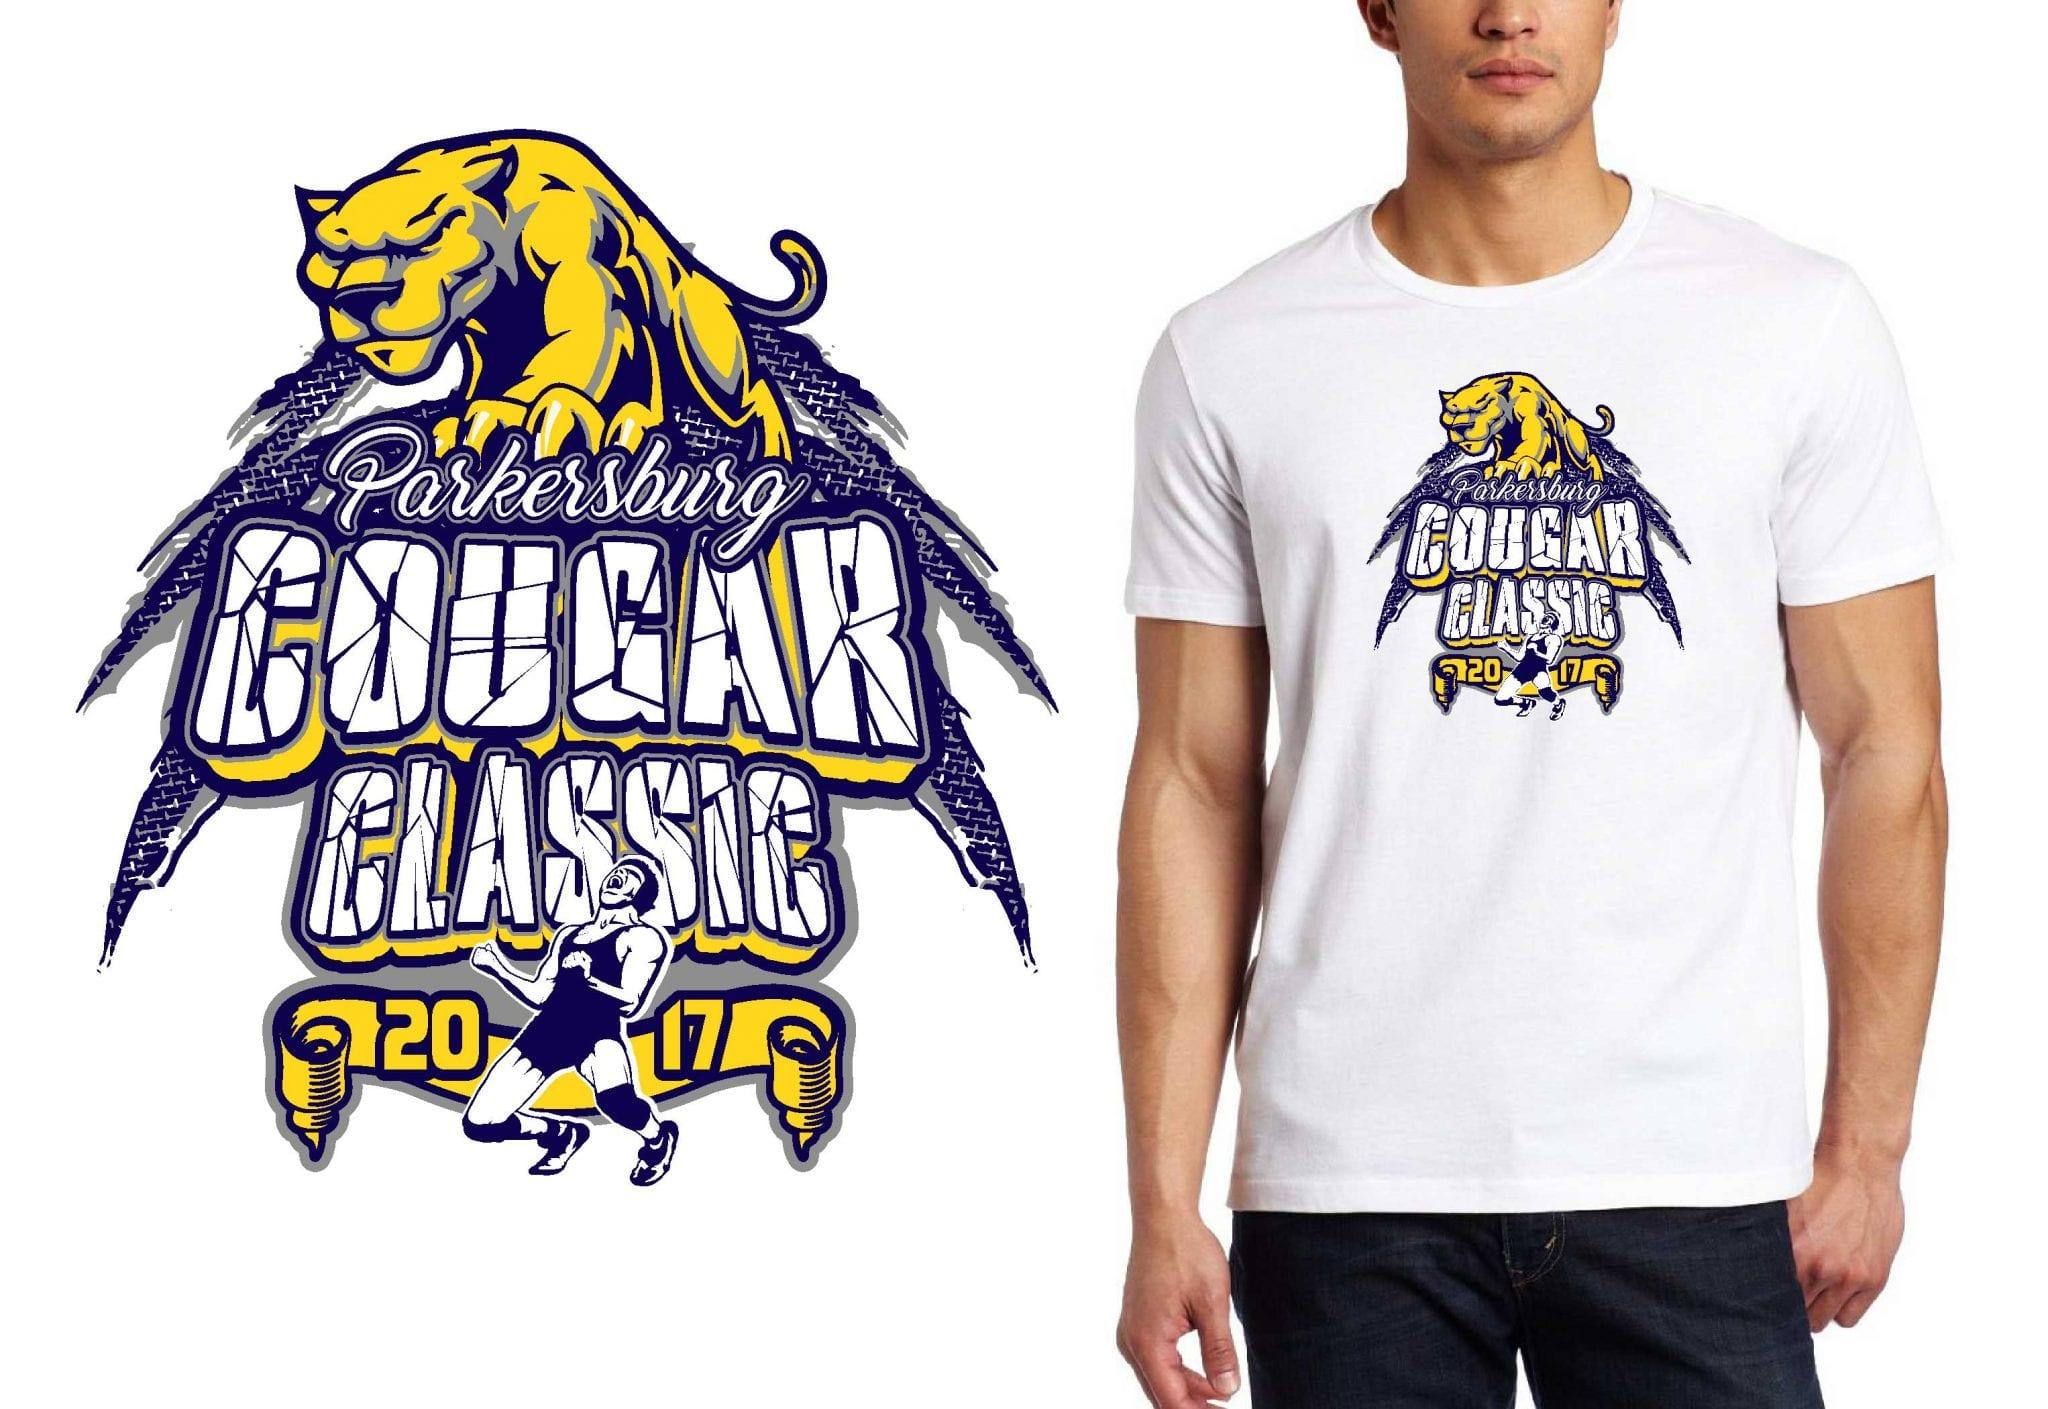 2017 Parkersburg Cougar Classic vector logo design for wrestling t-shirt UrArtStudio